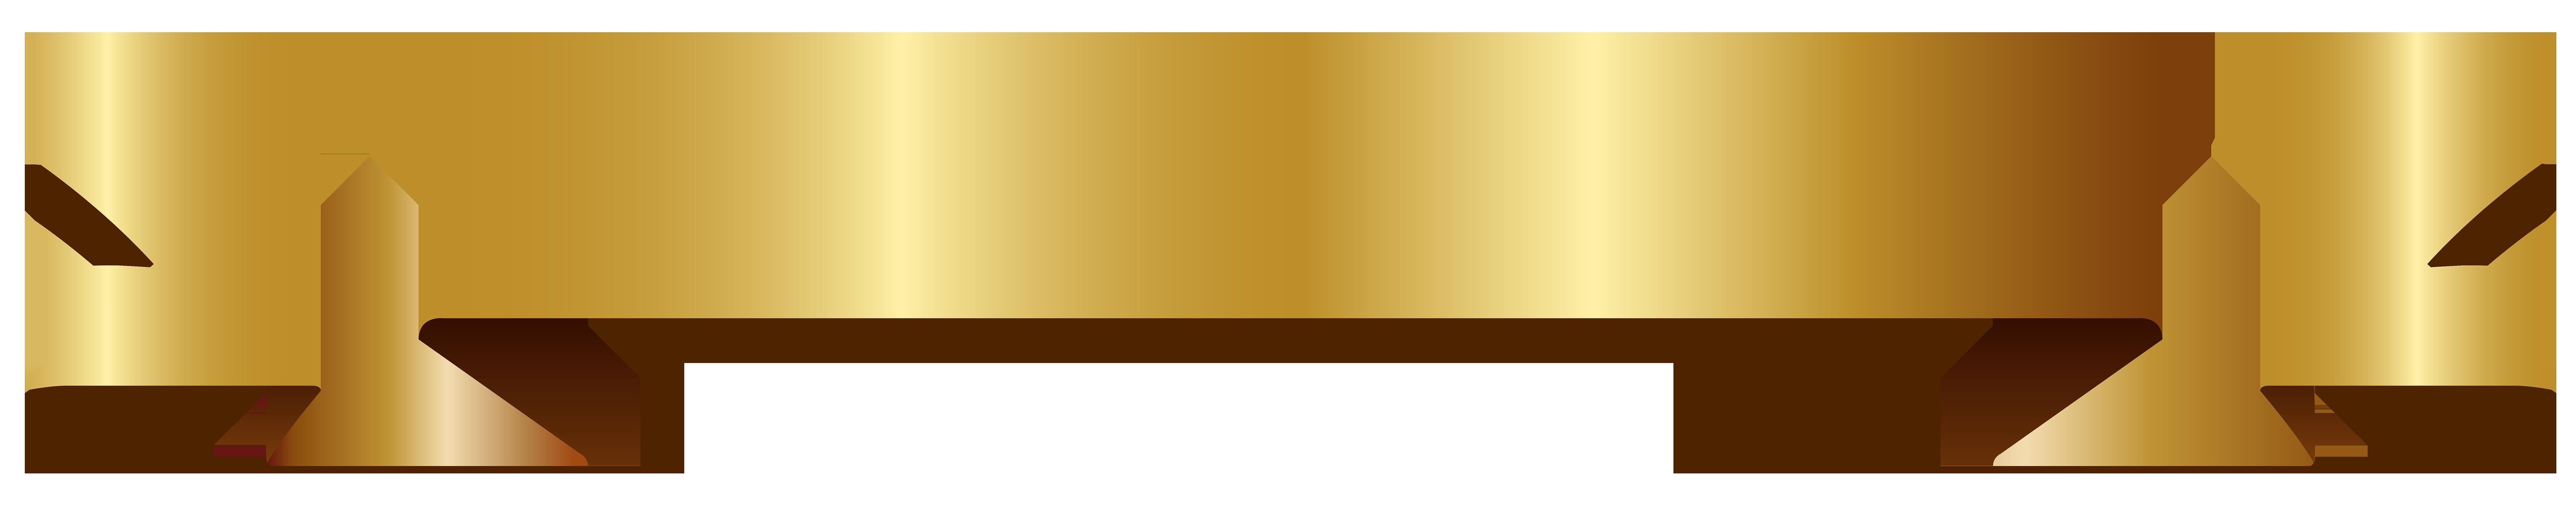 Families clipart banner. Gold transparent png clip